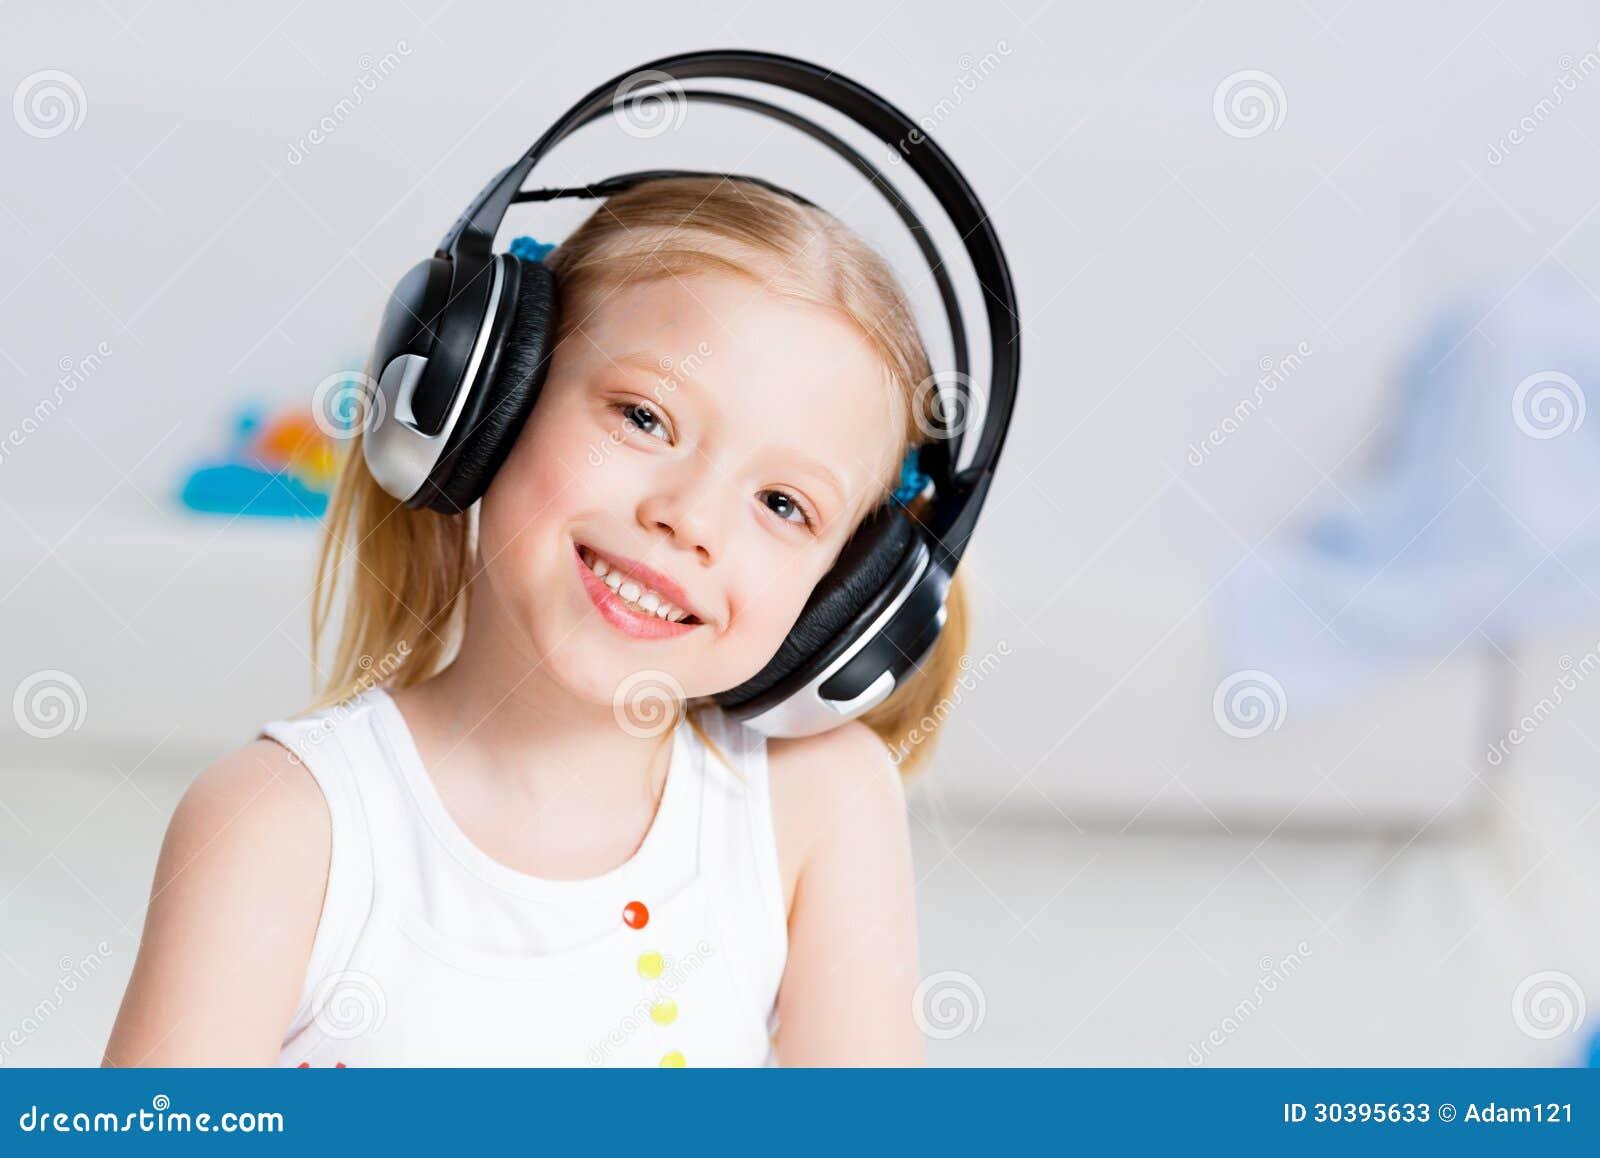 Girl Listening To Music In Living Room